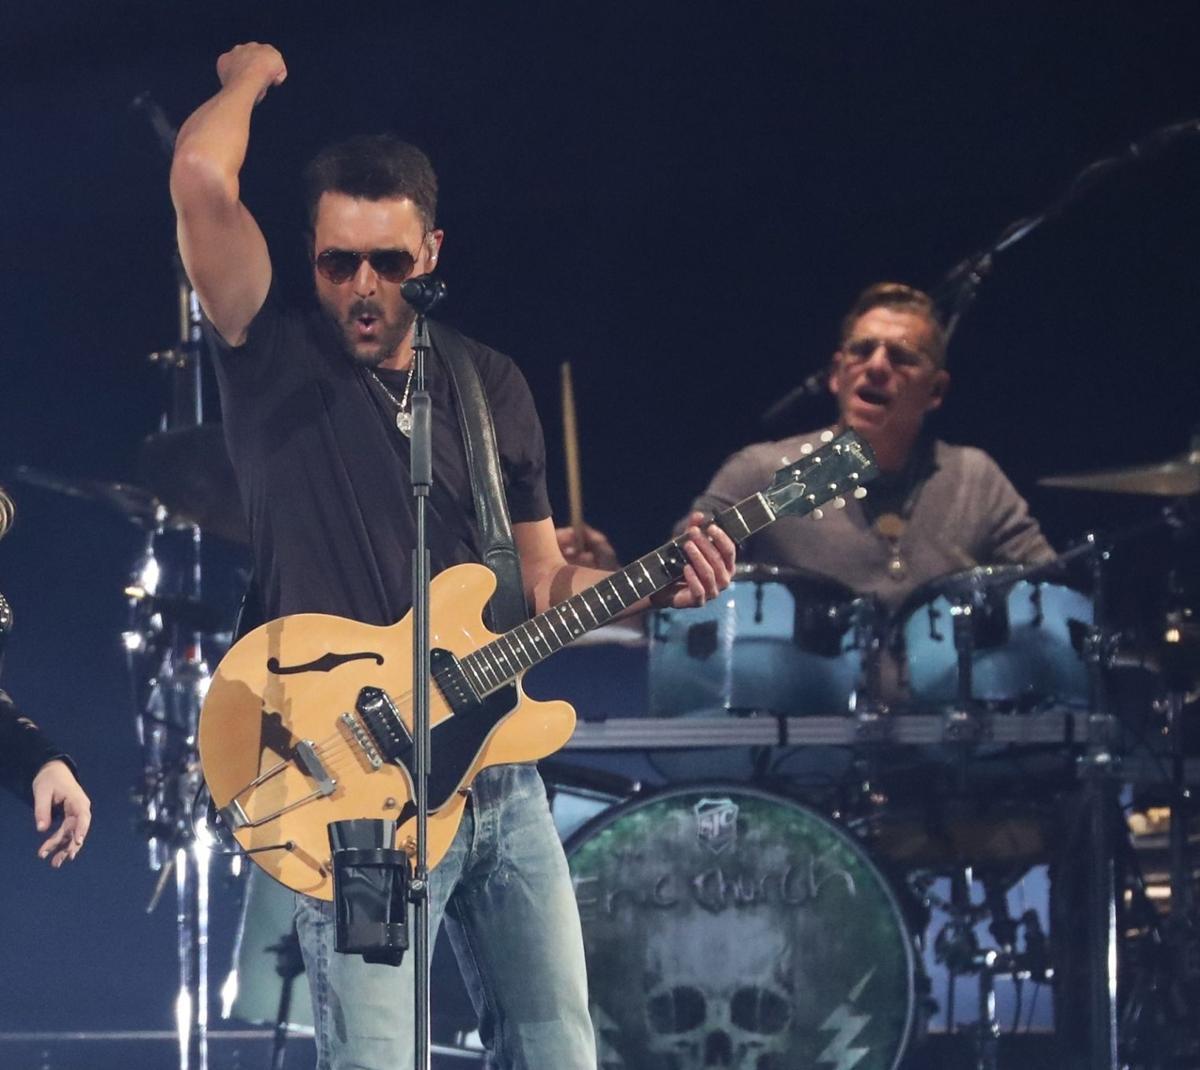 Eric Church entertains in KeyBank Center